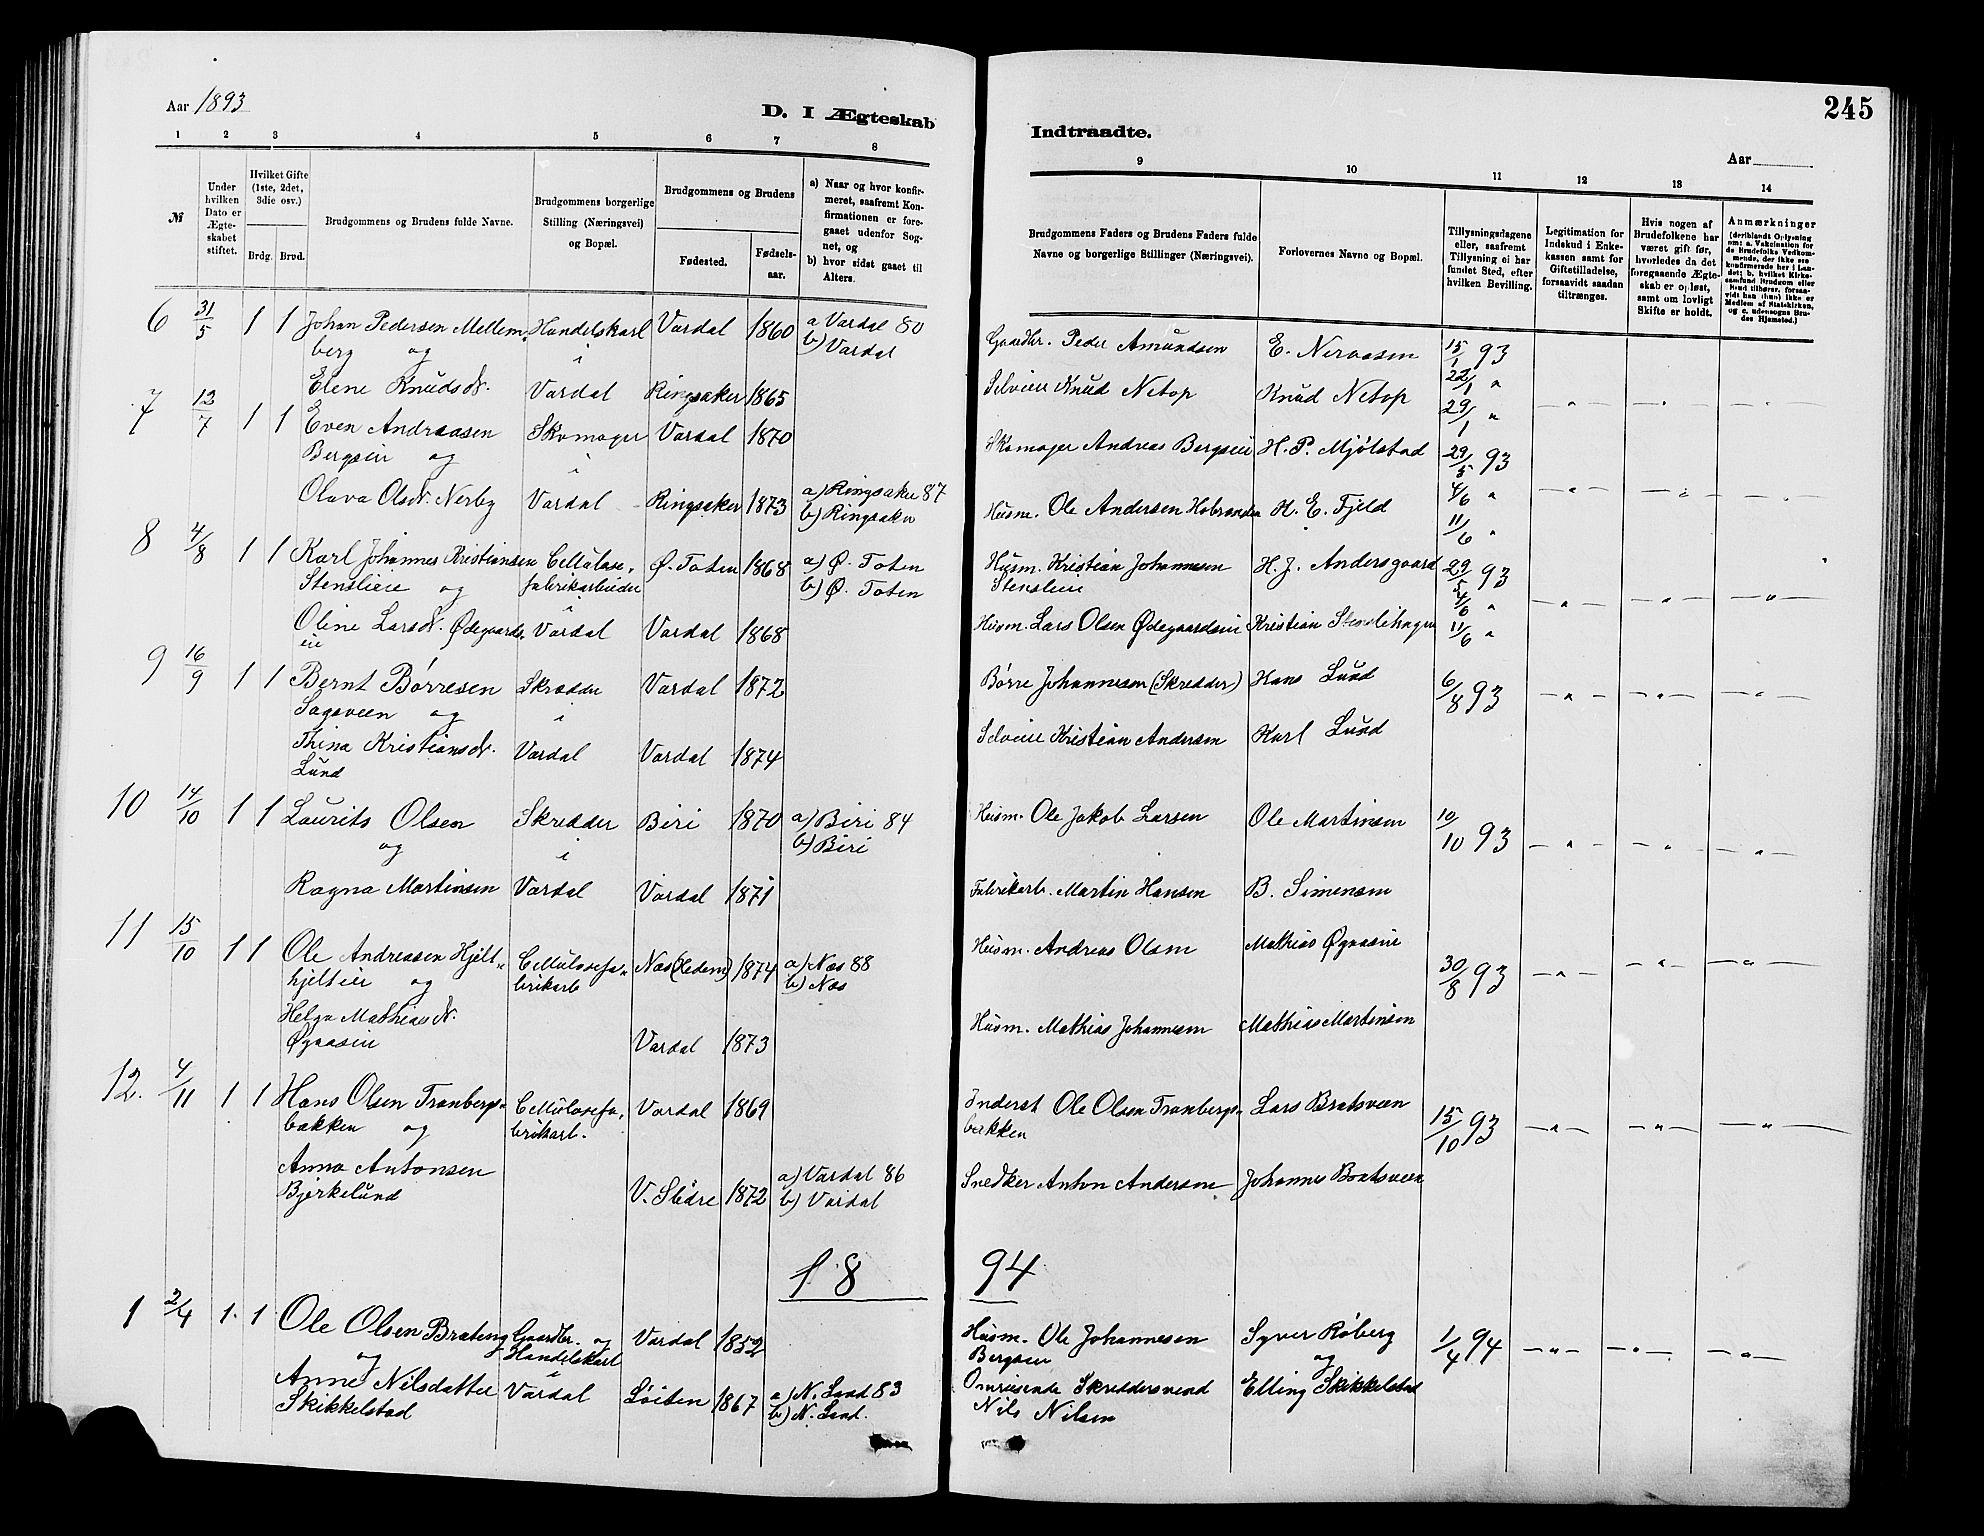 SAH, Vardal prestekontor, H/Ha/Hab/L0007: Klokkerbok nr. 7 /1, 1881-1895, s. 245